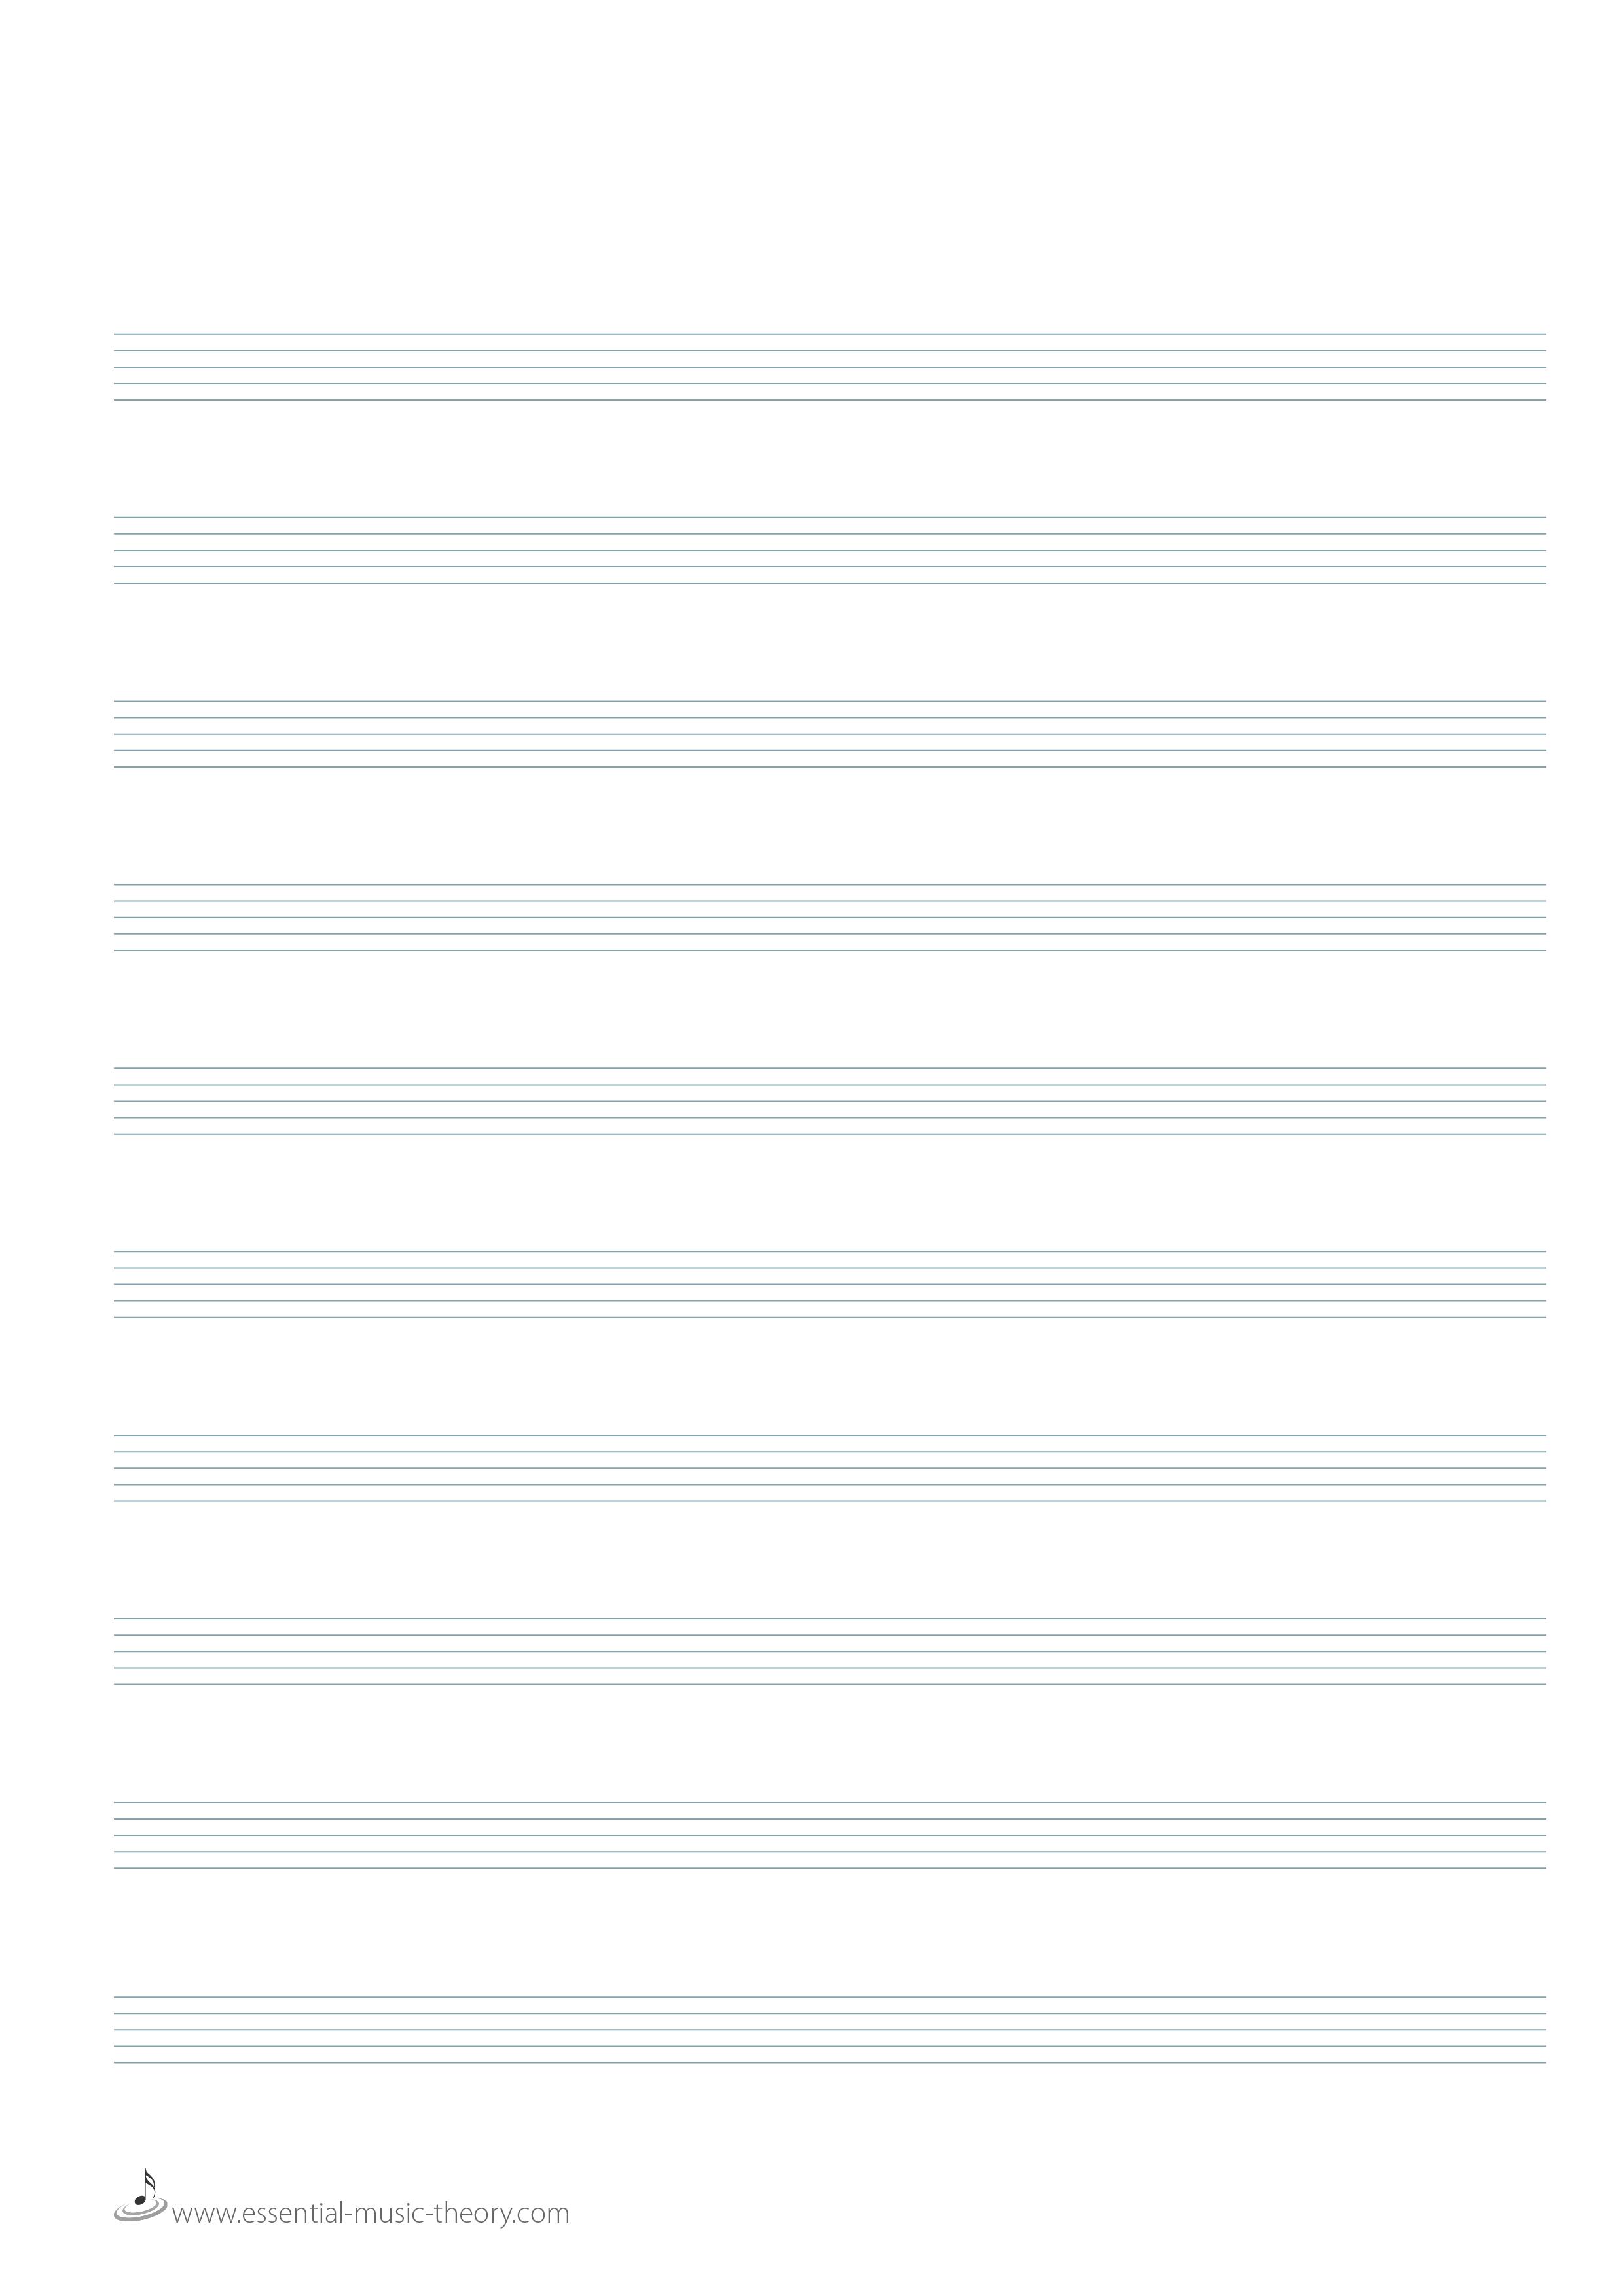 Blank Manuscript Paper